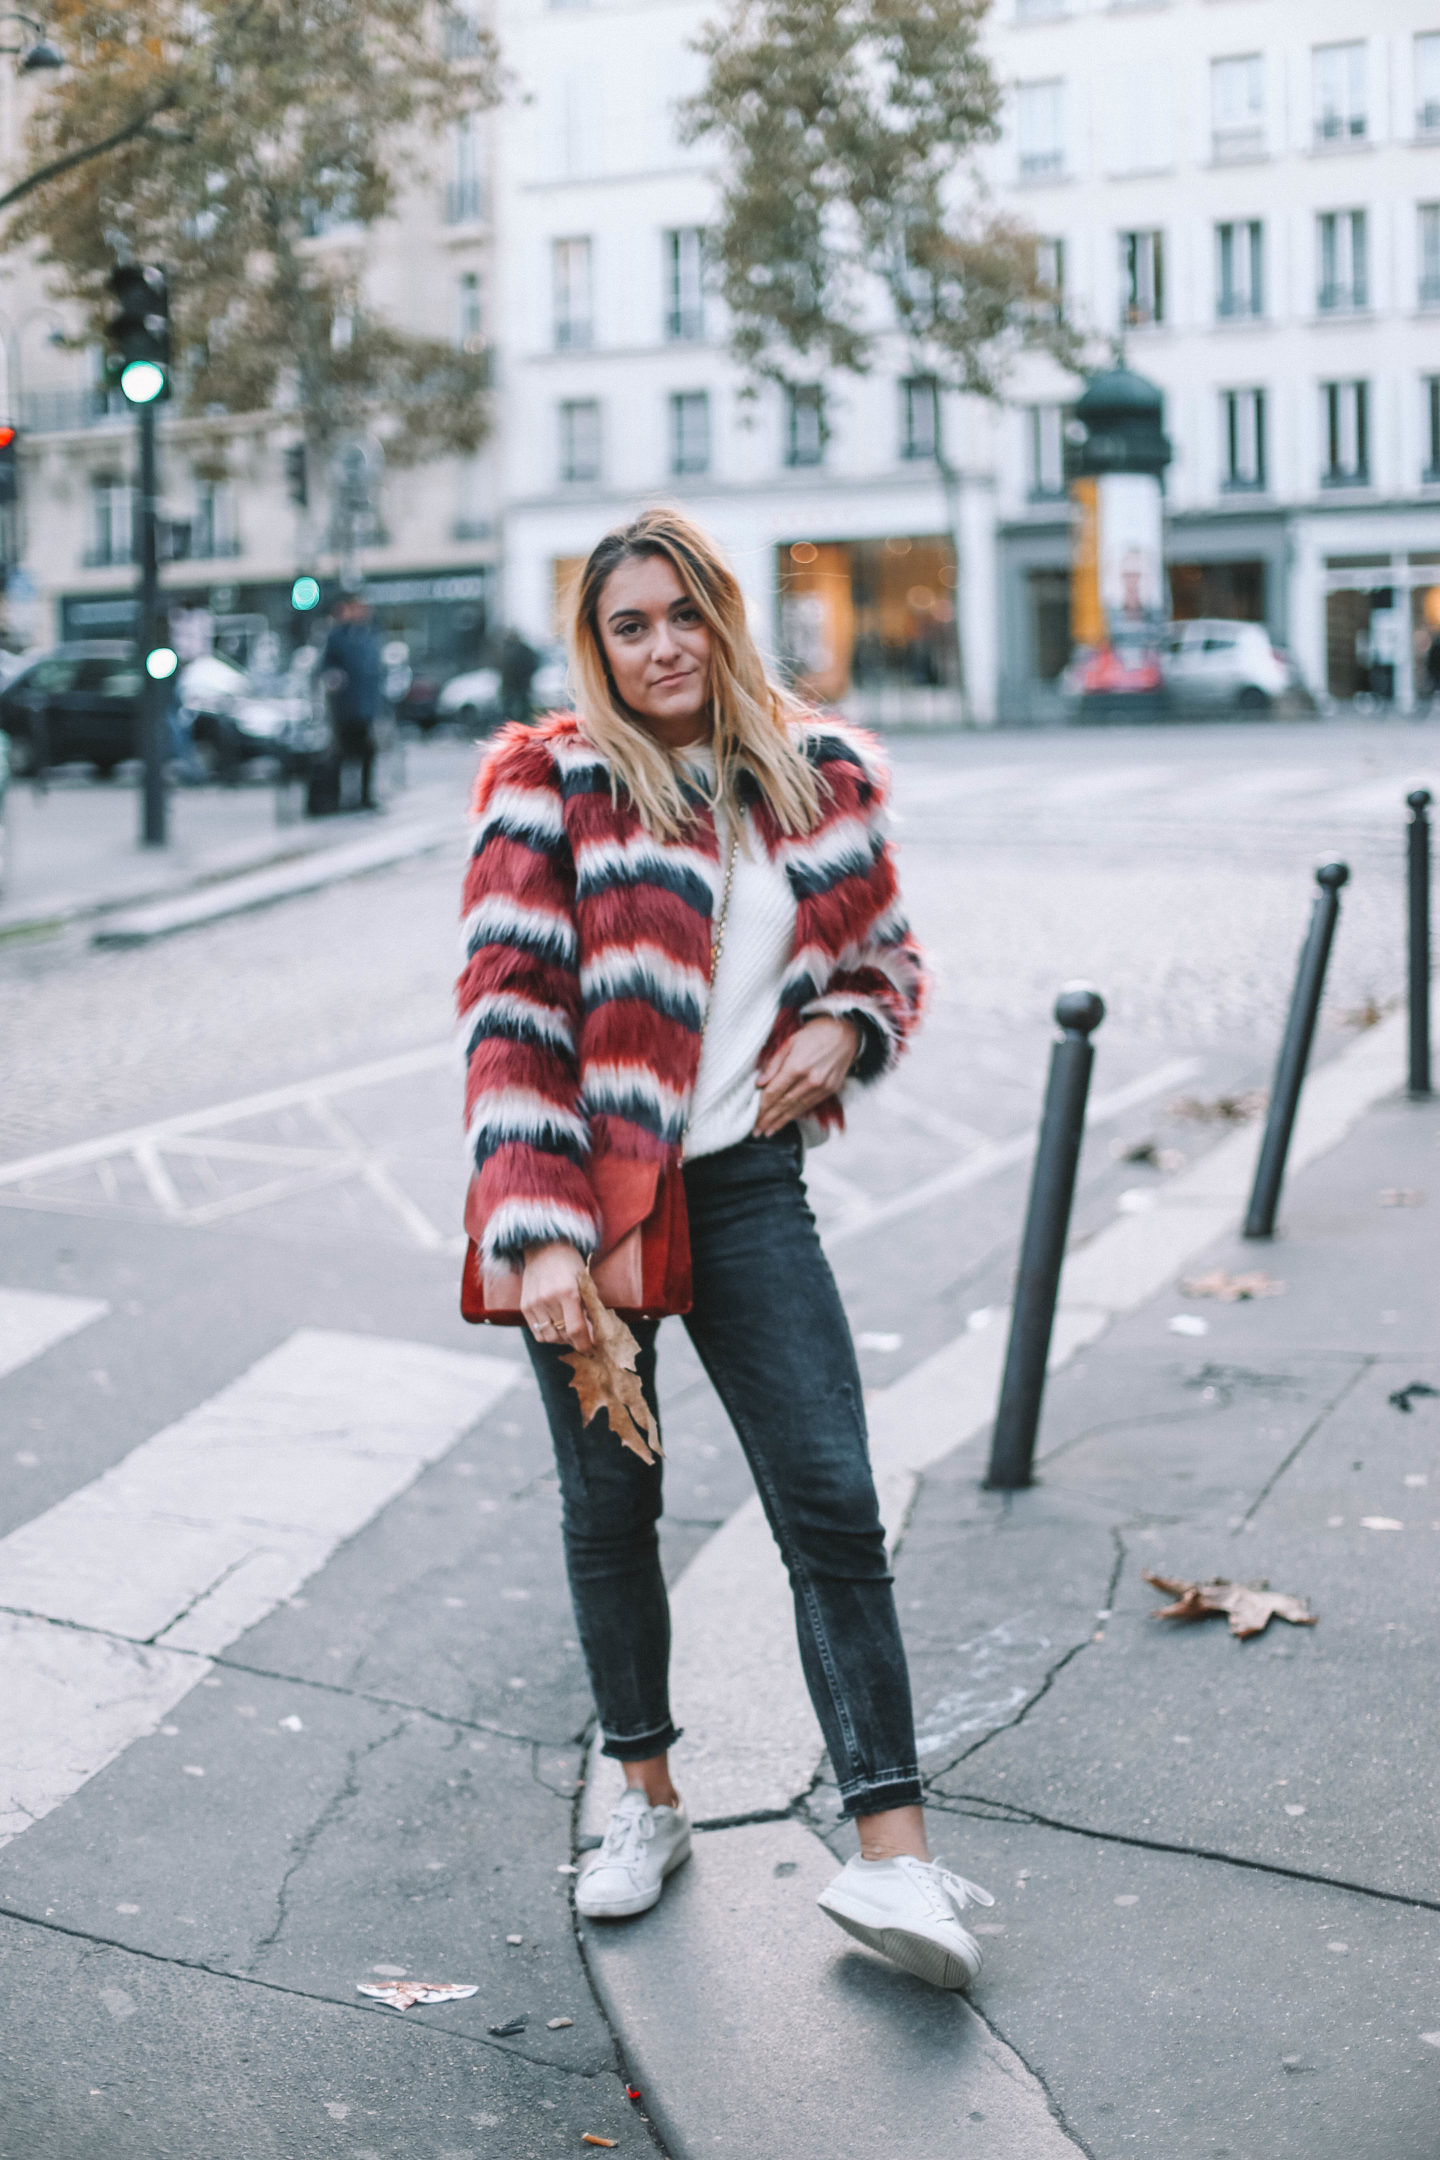 Sézane - Blondie Baby blog mode et voyages